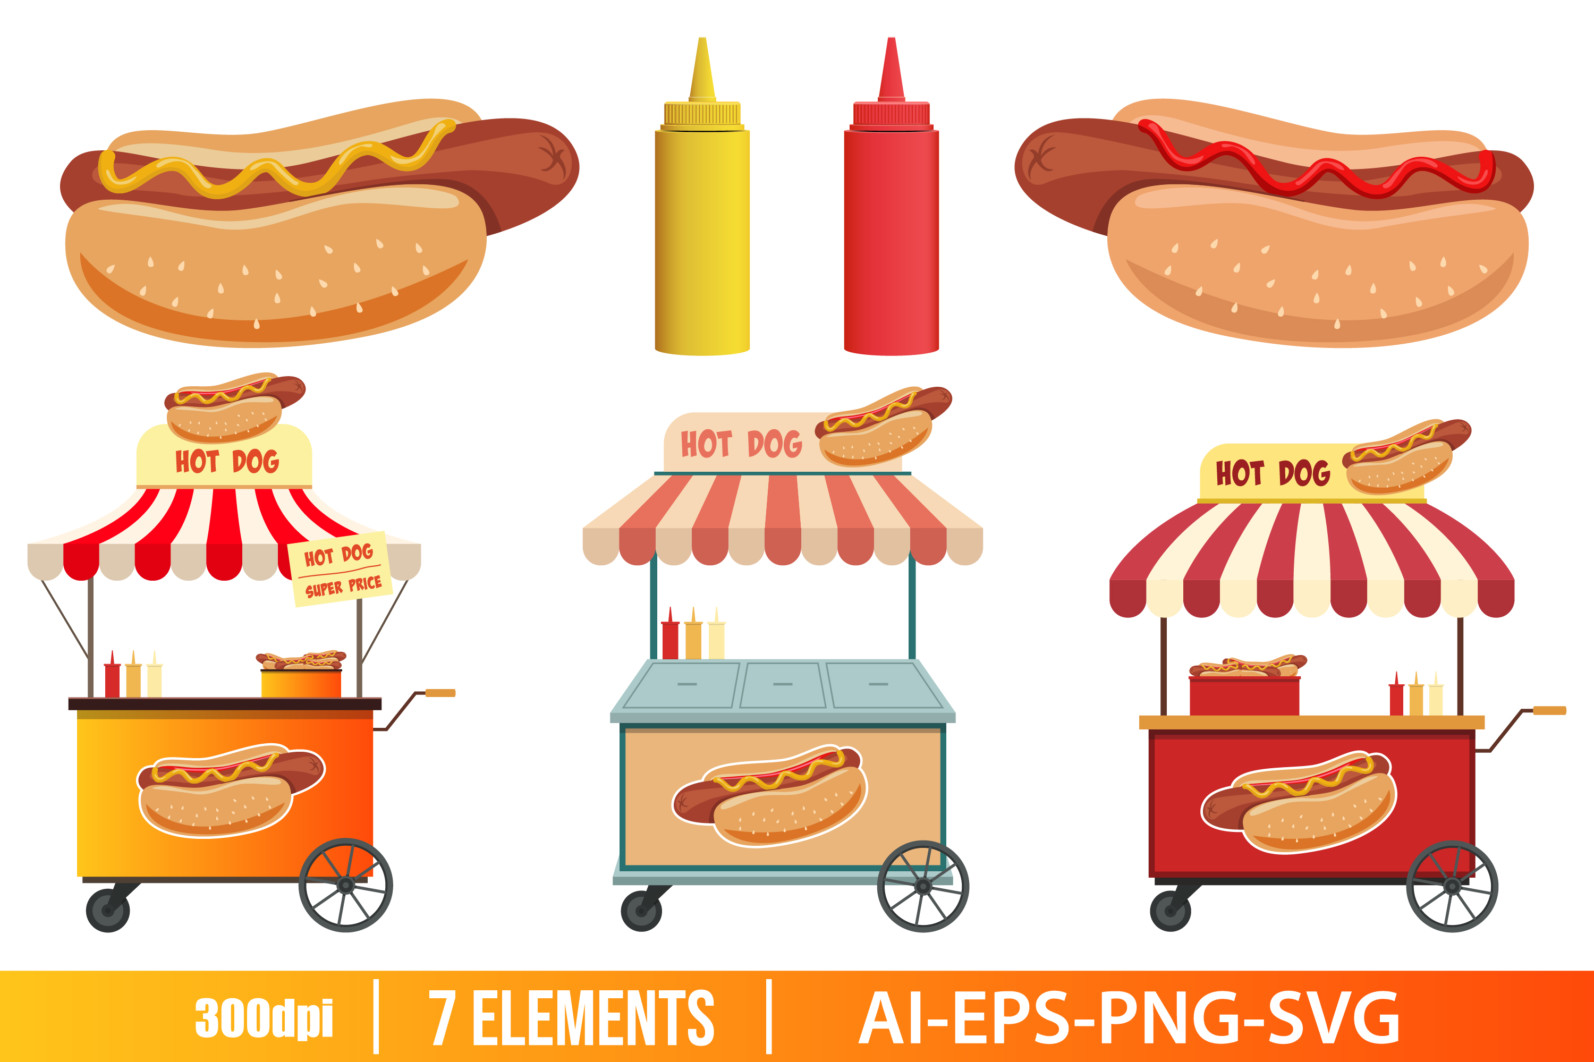 Hot dog street shop clipart vector design illustration. Hot dog set. Vector Clipart Print - HOT DOG scaled -